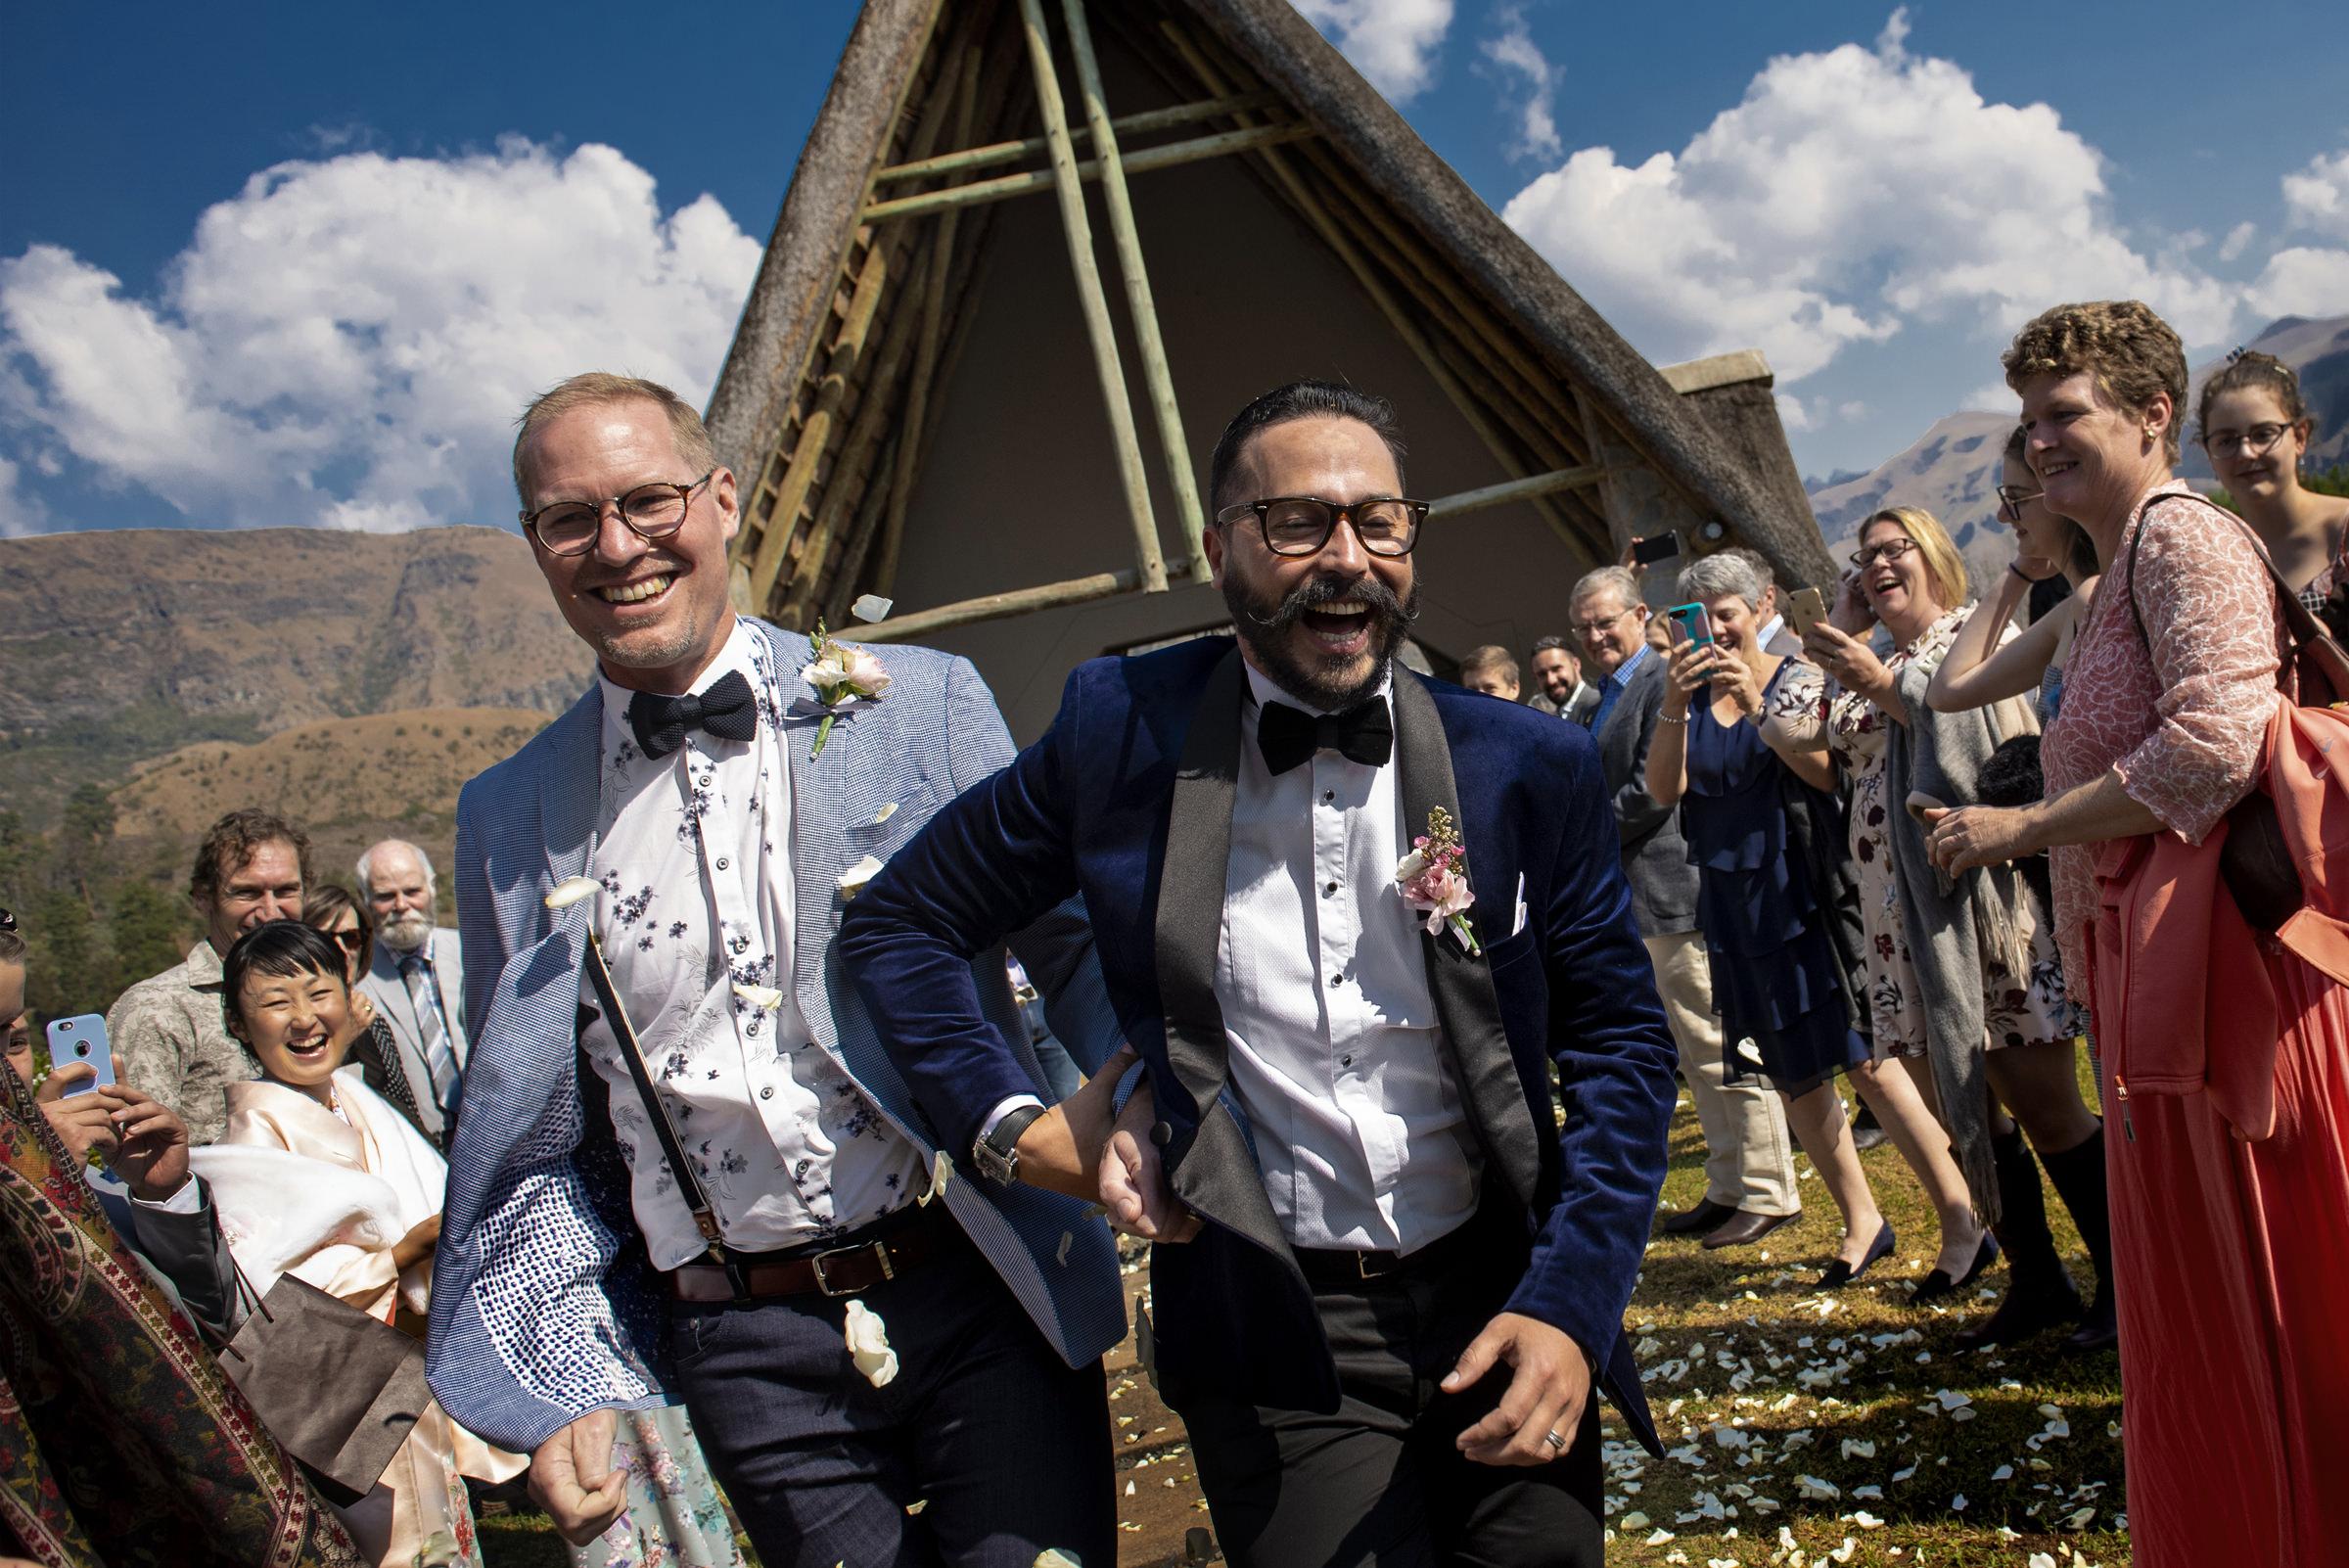 two-joyful-grooms-exit-their-ceremony-jacki-bruniquel